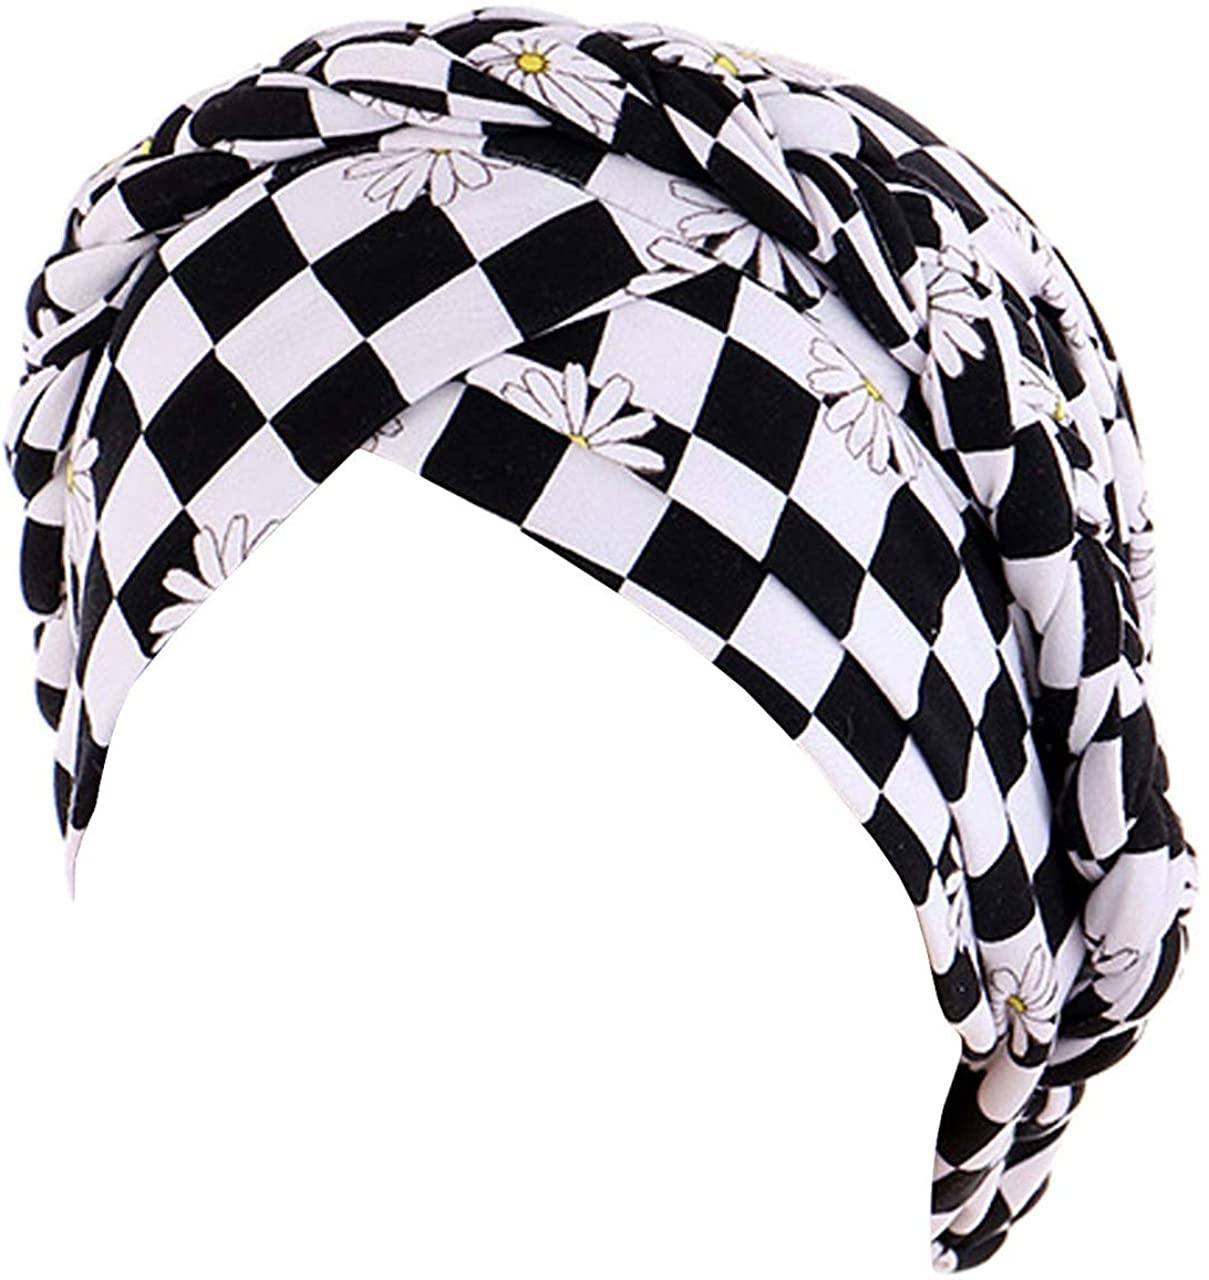 Biruil Chemo Cancer Braid Turban Cap Ethnic Bohemia Twisted Hair Cover Wrap Turban Headwear